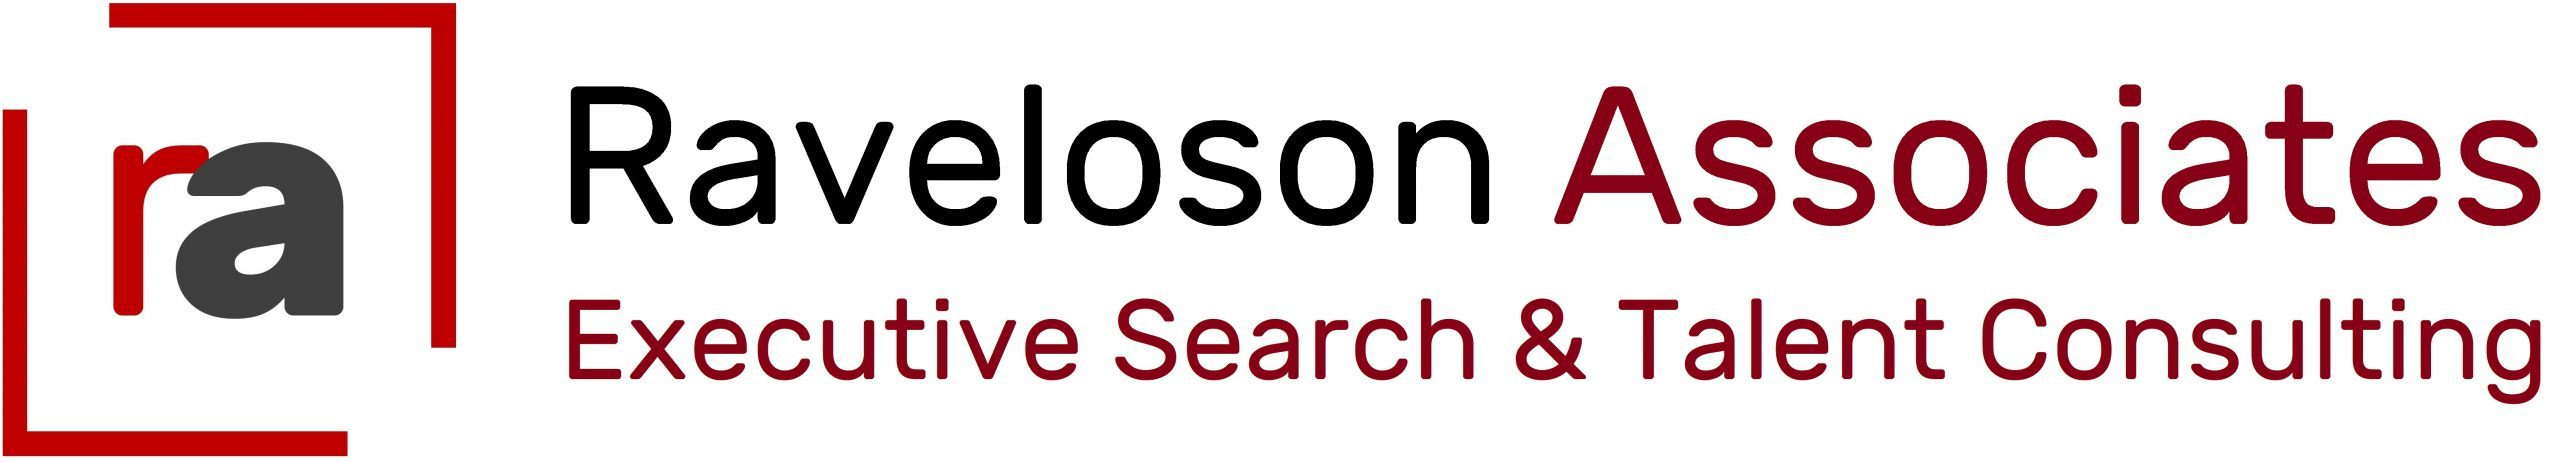 Raveloson Associates